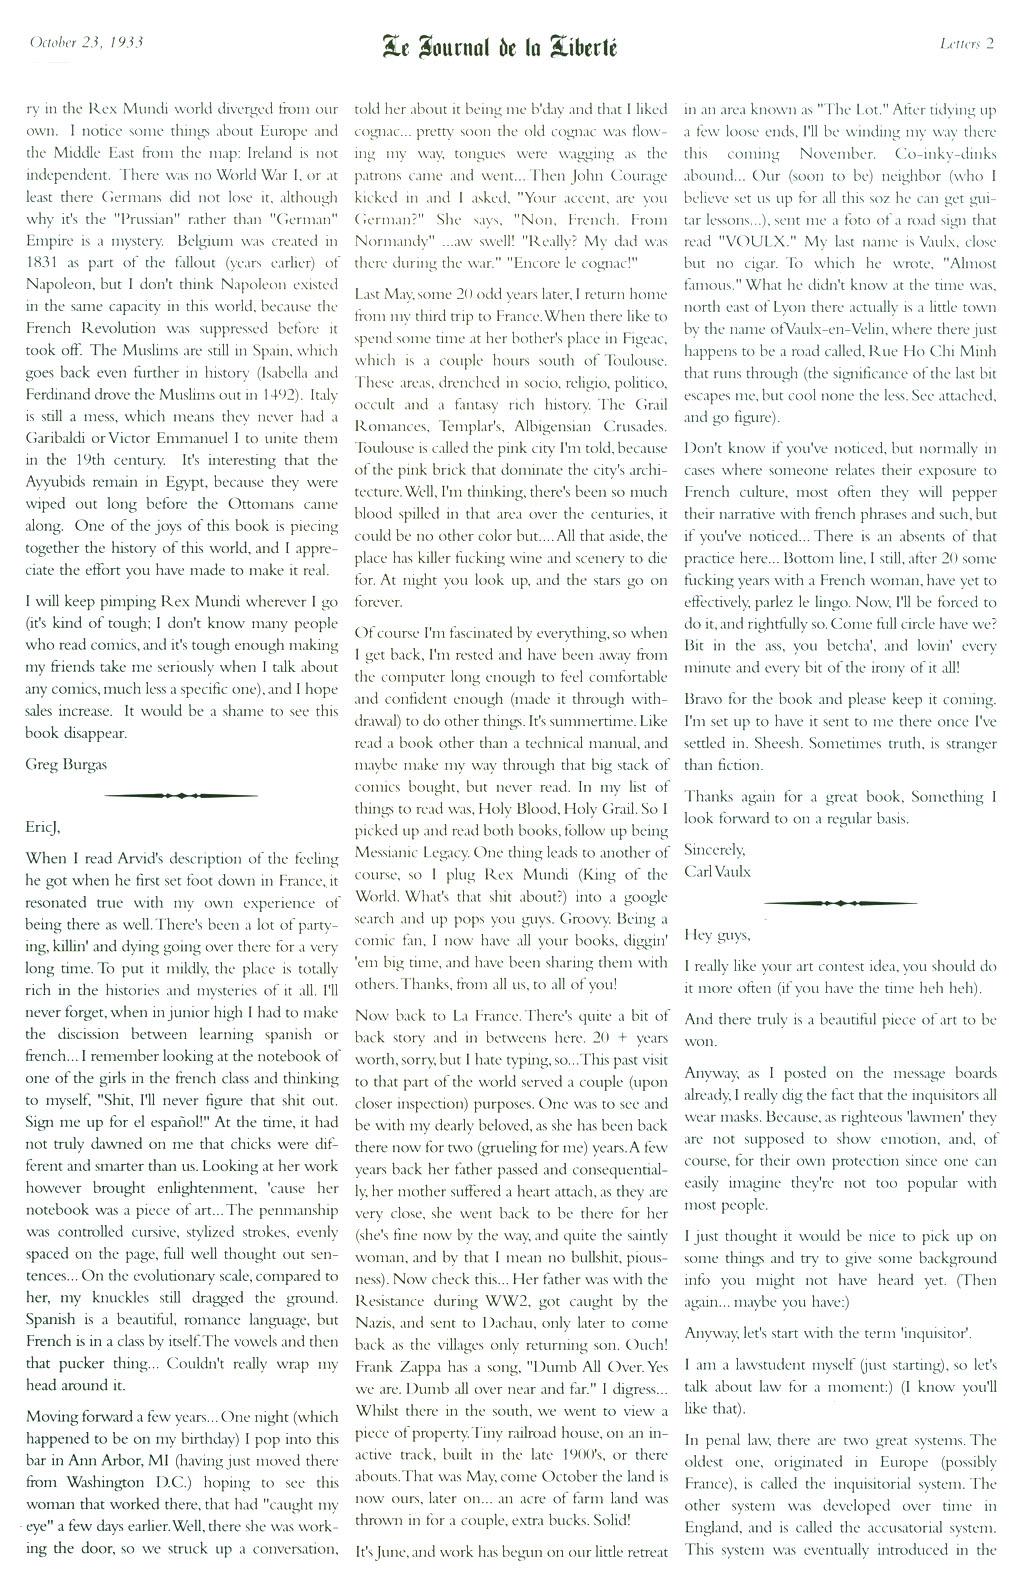 Read online Rex Mundi comic -  Issue #5 - 29